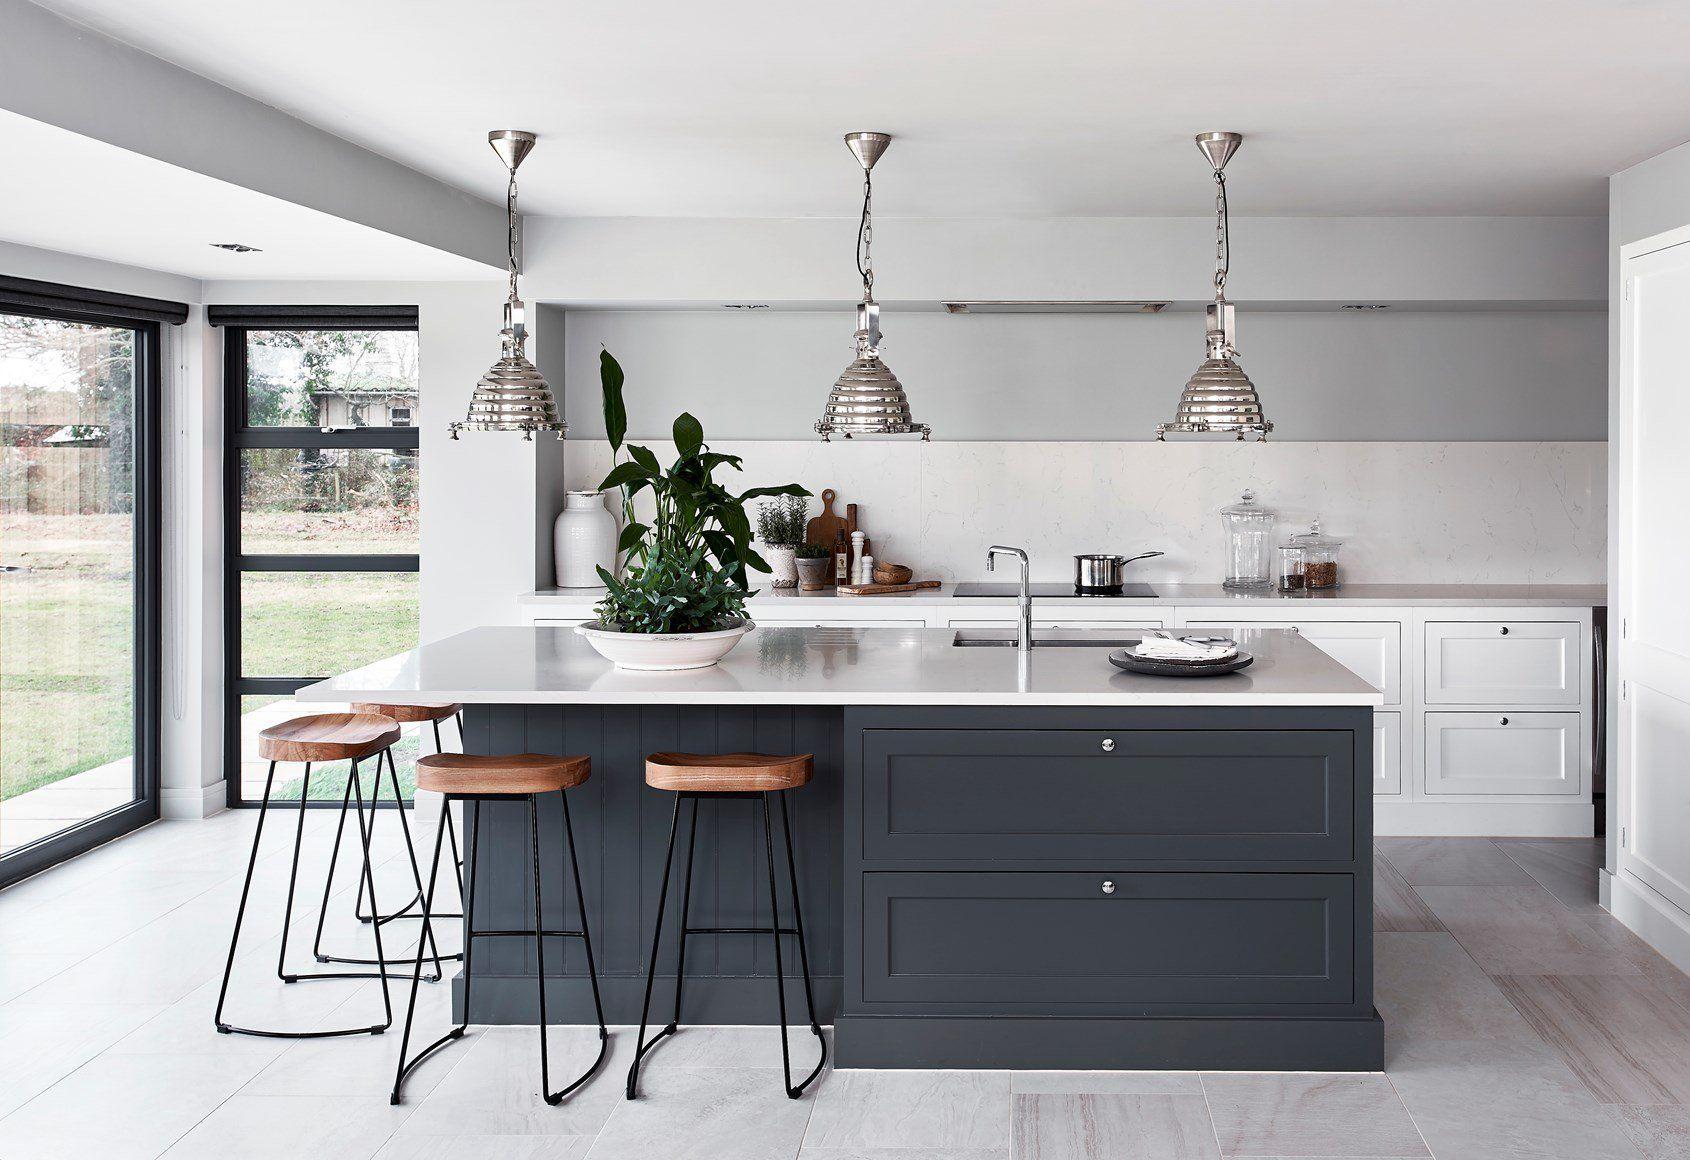 Debbie Pearce Her Henley Kitchen Kitchens Pinterest  # Muebles Estilo Pearce